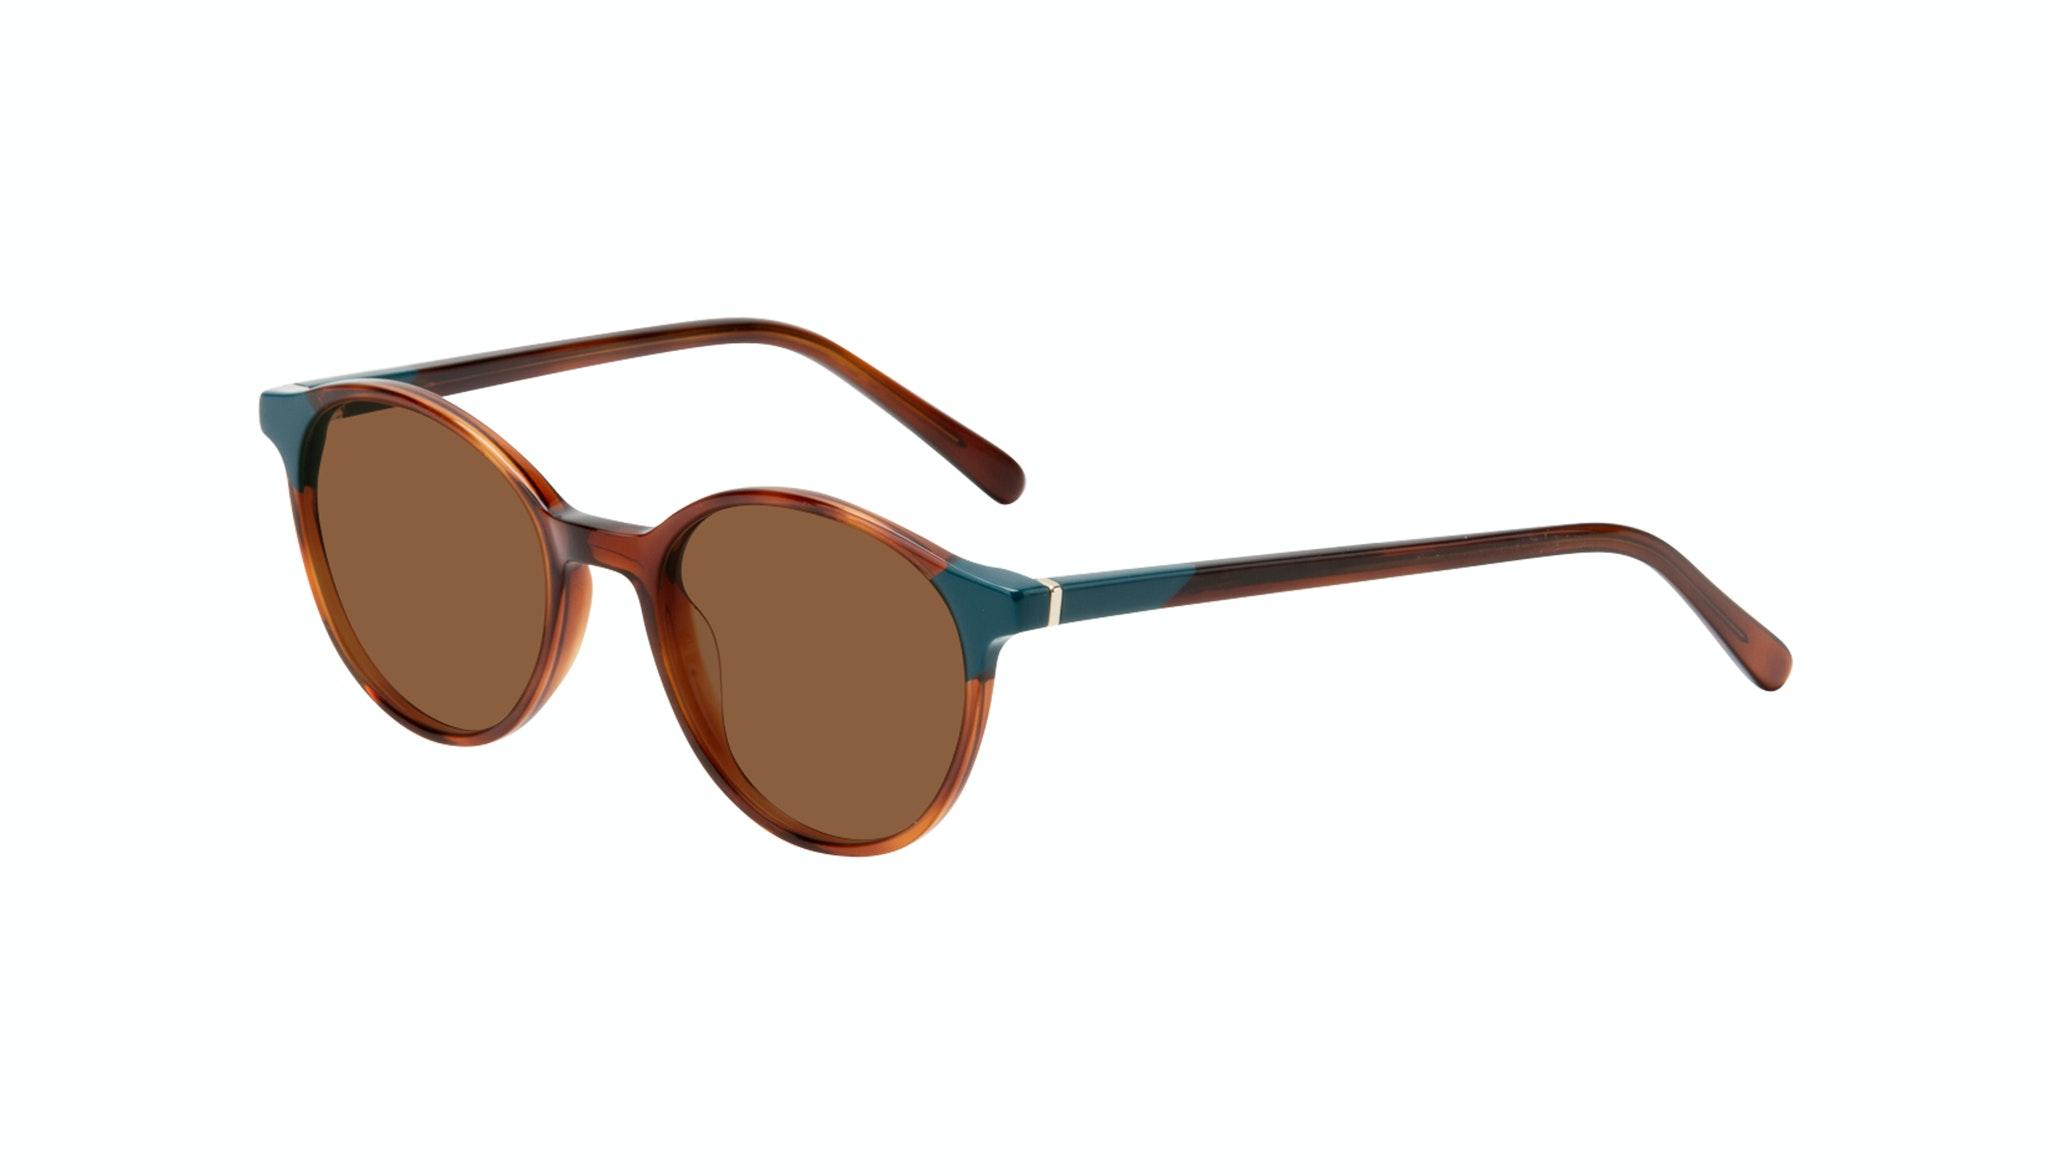 Affordable Fashion Glasses Round Sunglasses Women Vivid Teal Tort Tilt